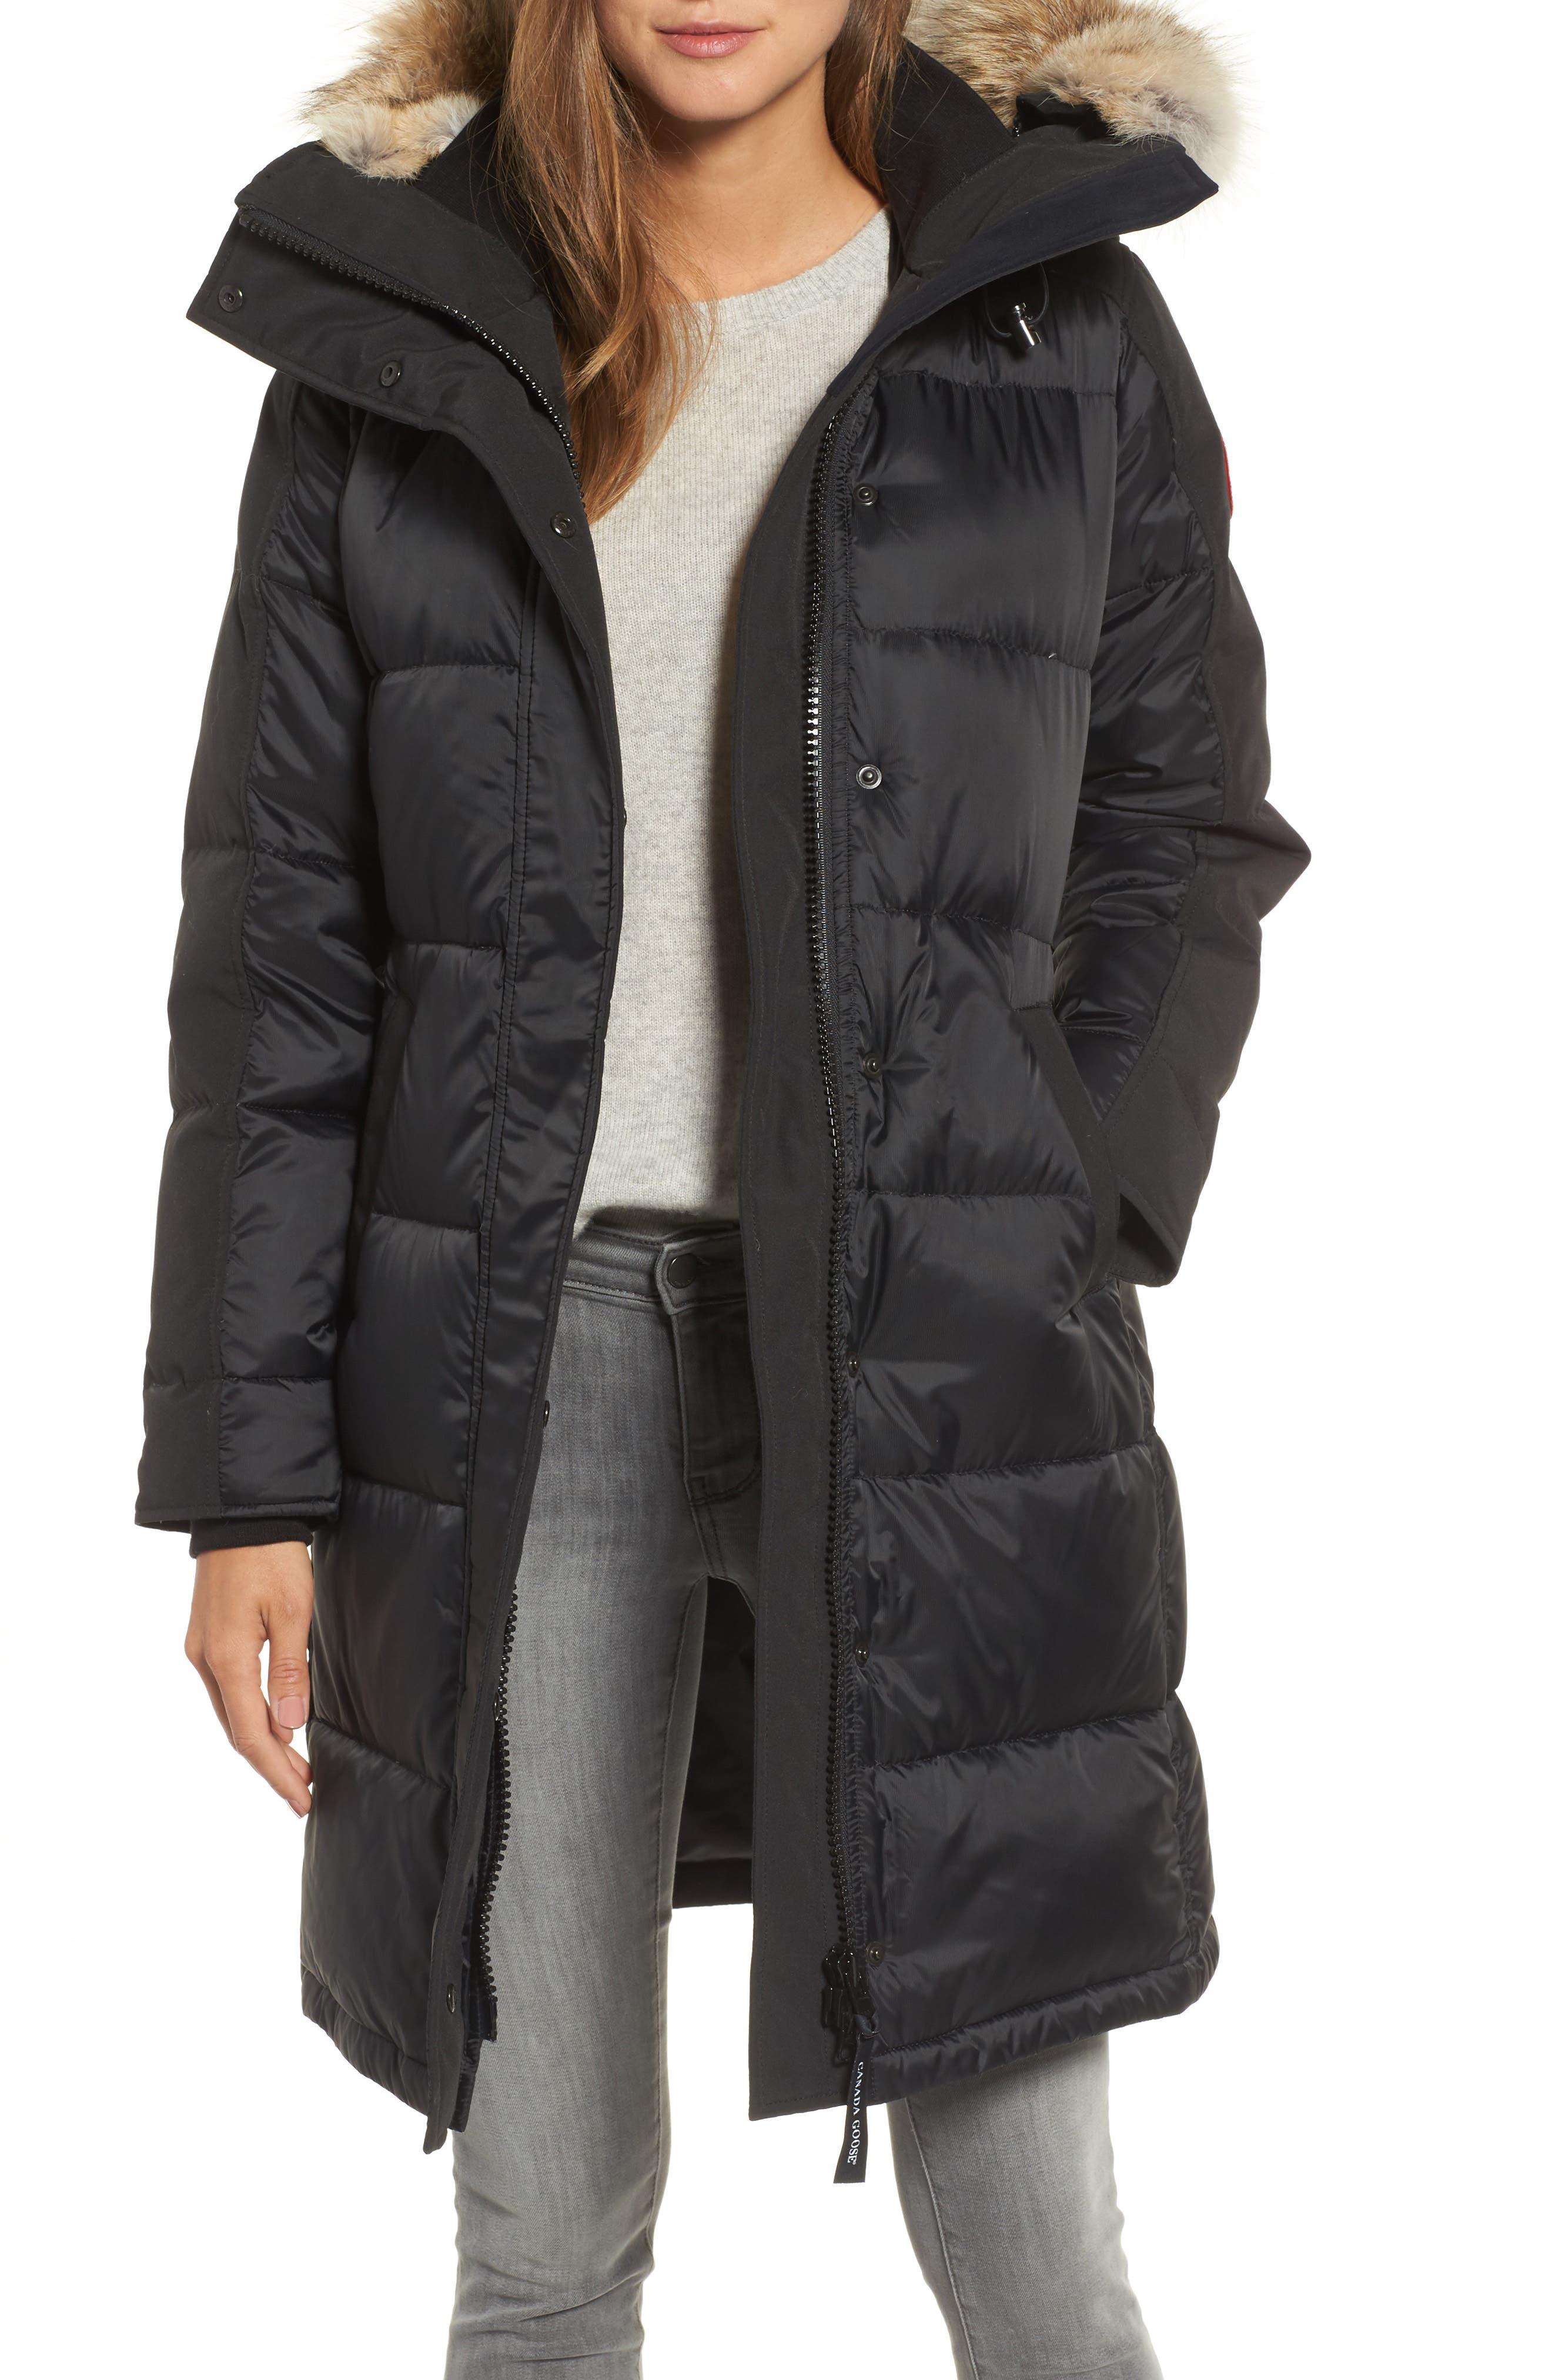 Main Image - Canada Goose Rowley Down Parka with Genuine Fur Collar